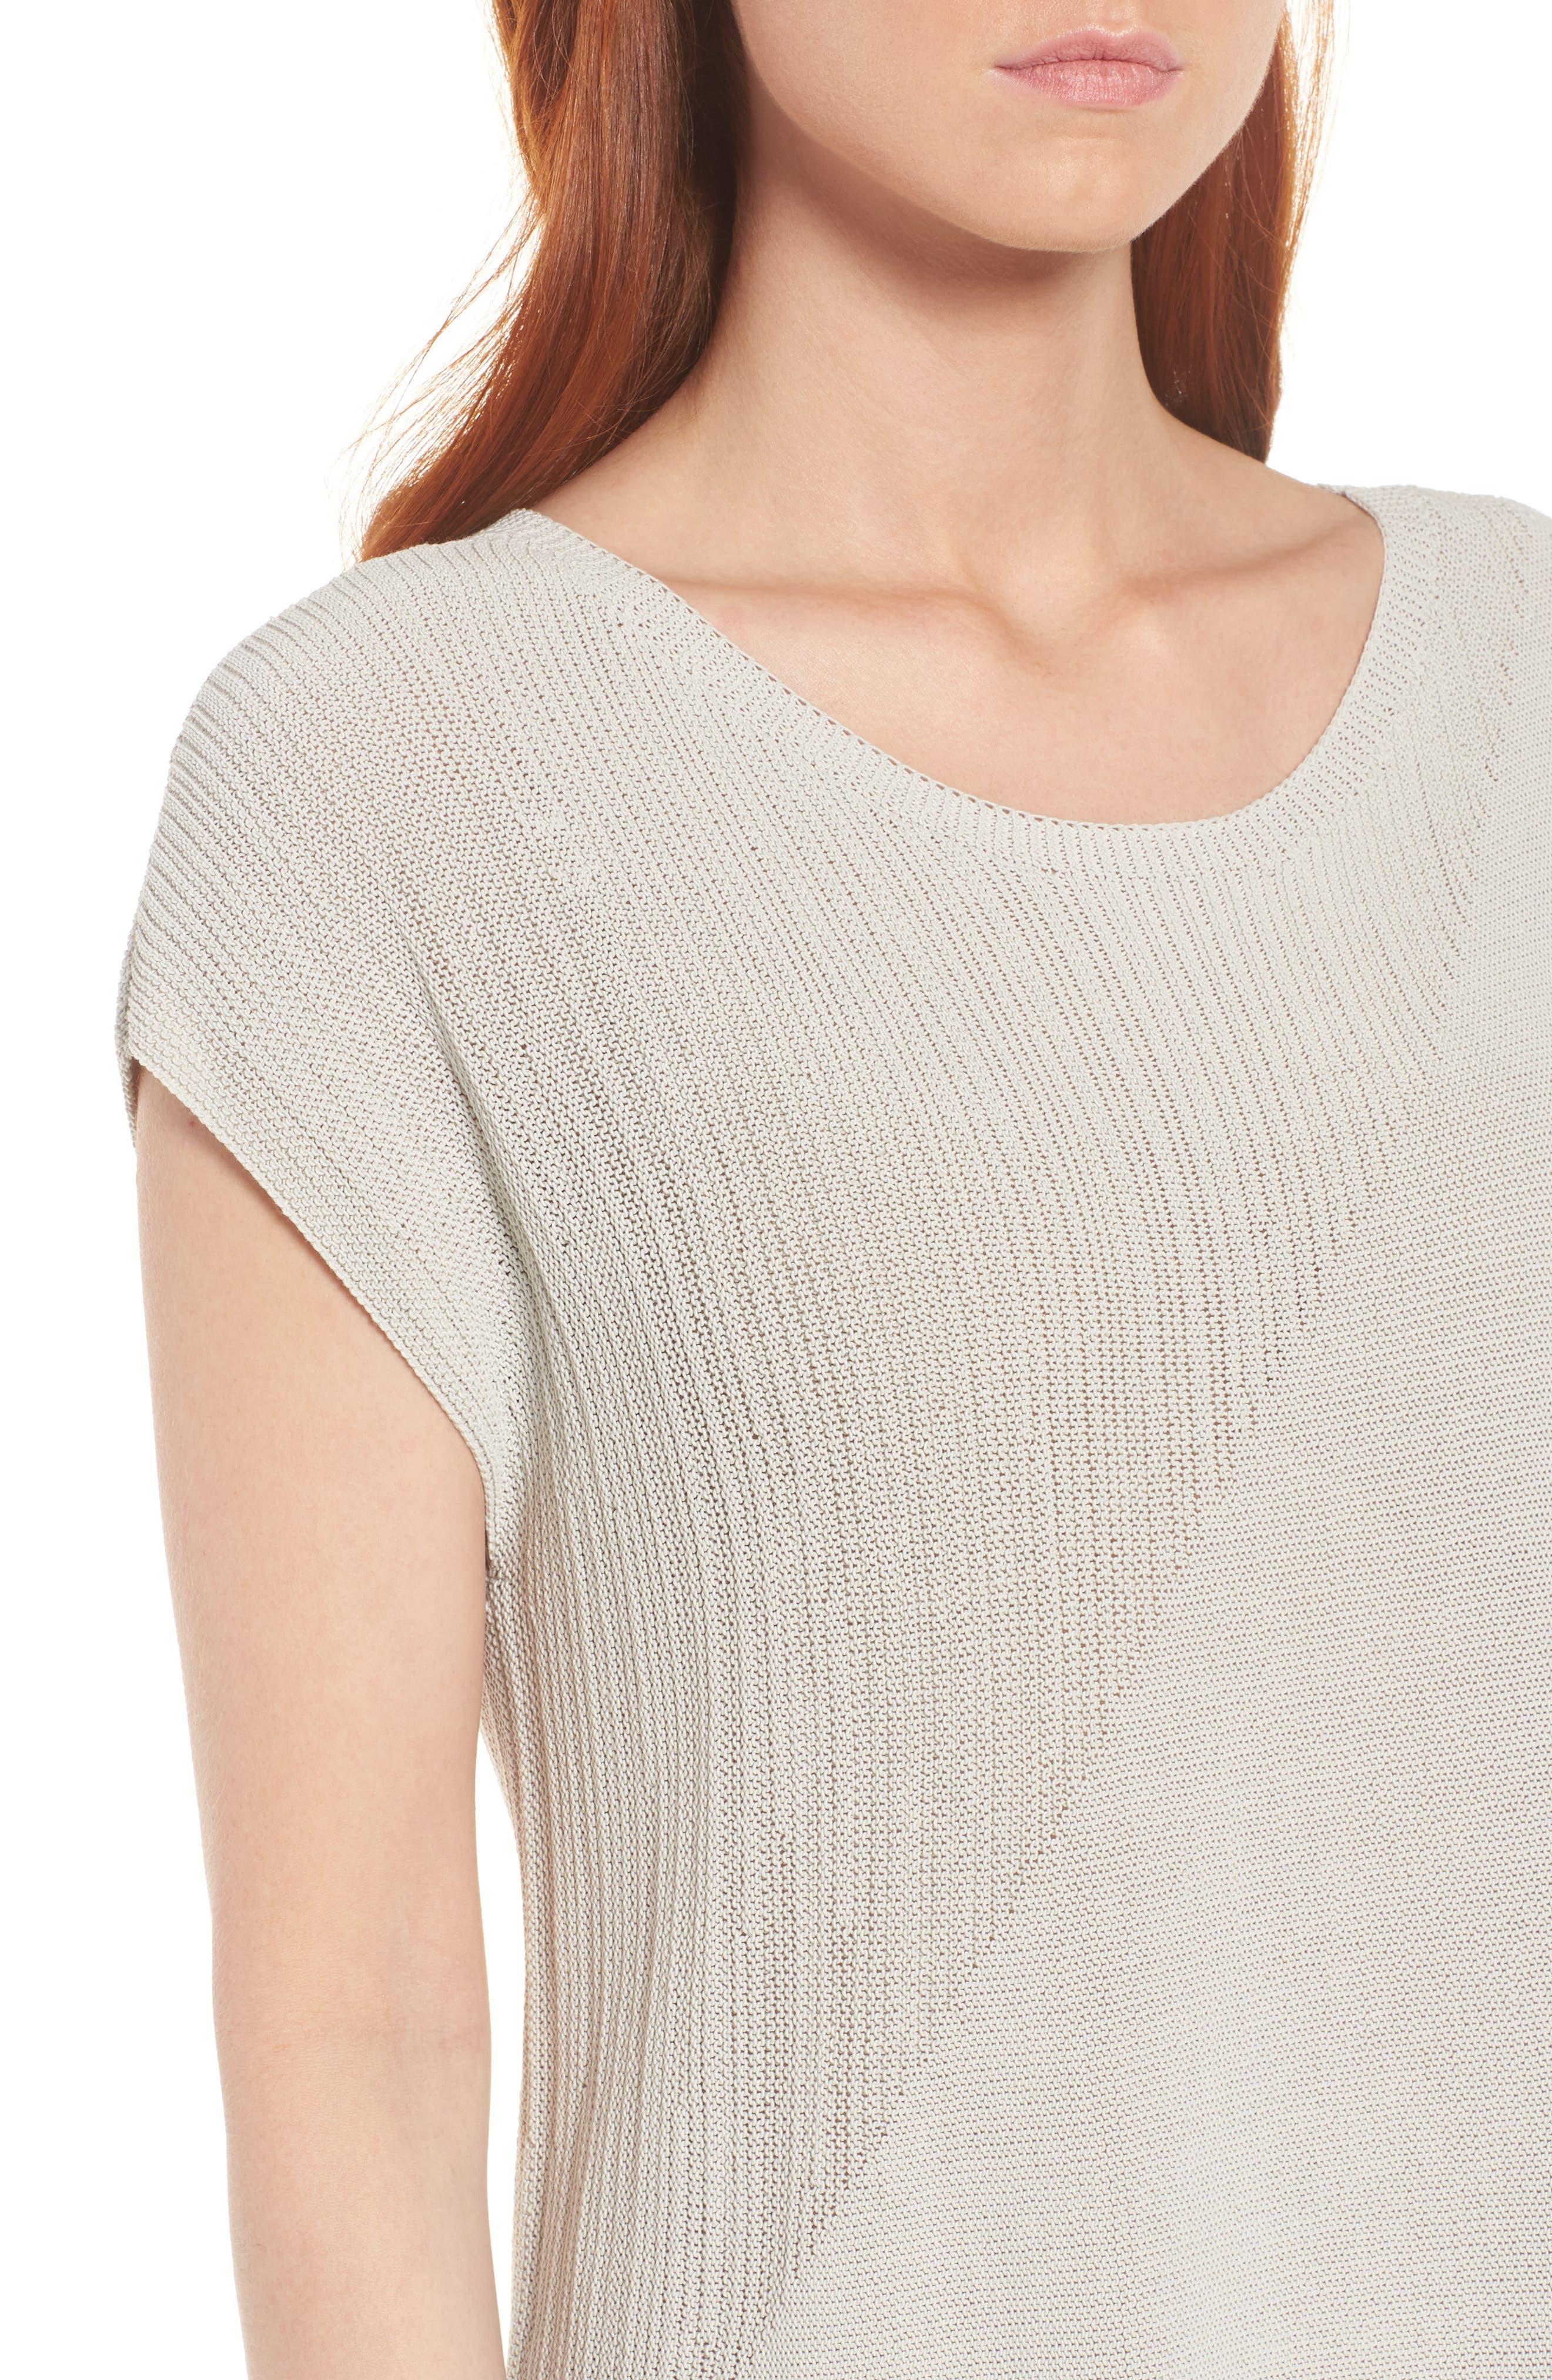 Organic Cotton Tunic Top,                             Alternate thumbnail 4, color,                             Bone